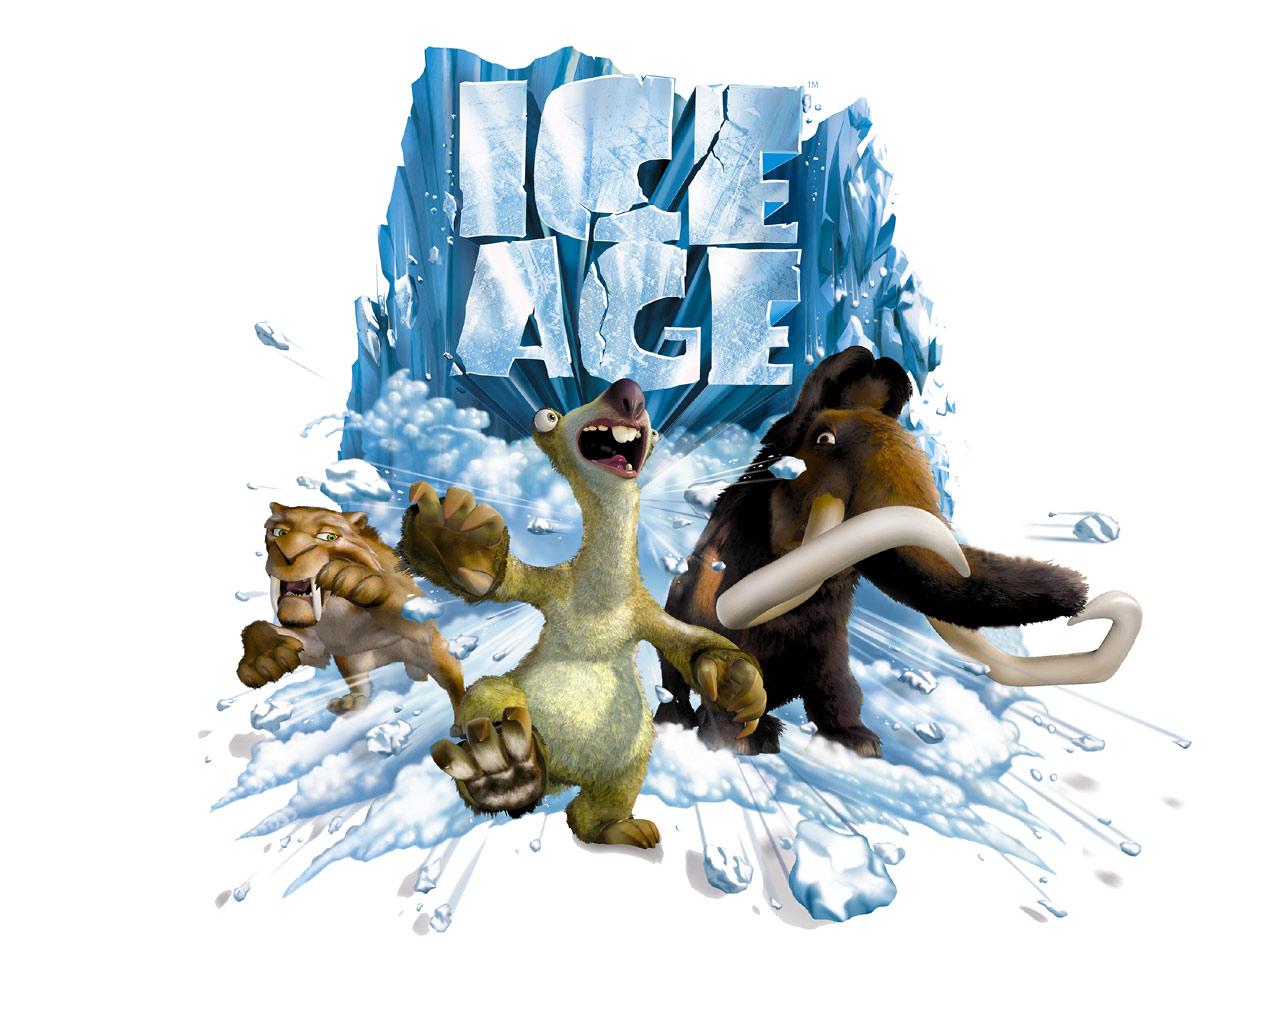 Cartoons Ice Age Free S 215858 Wallpaper wallpaper